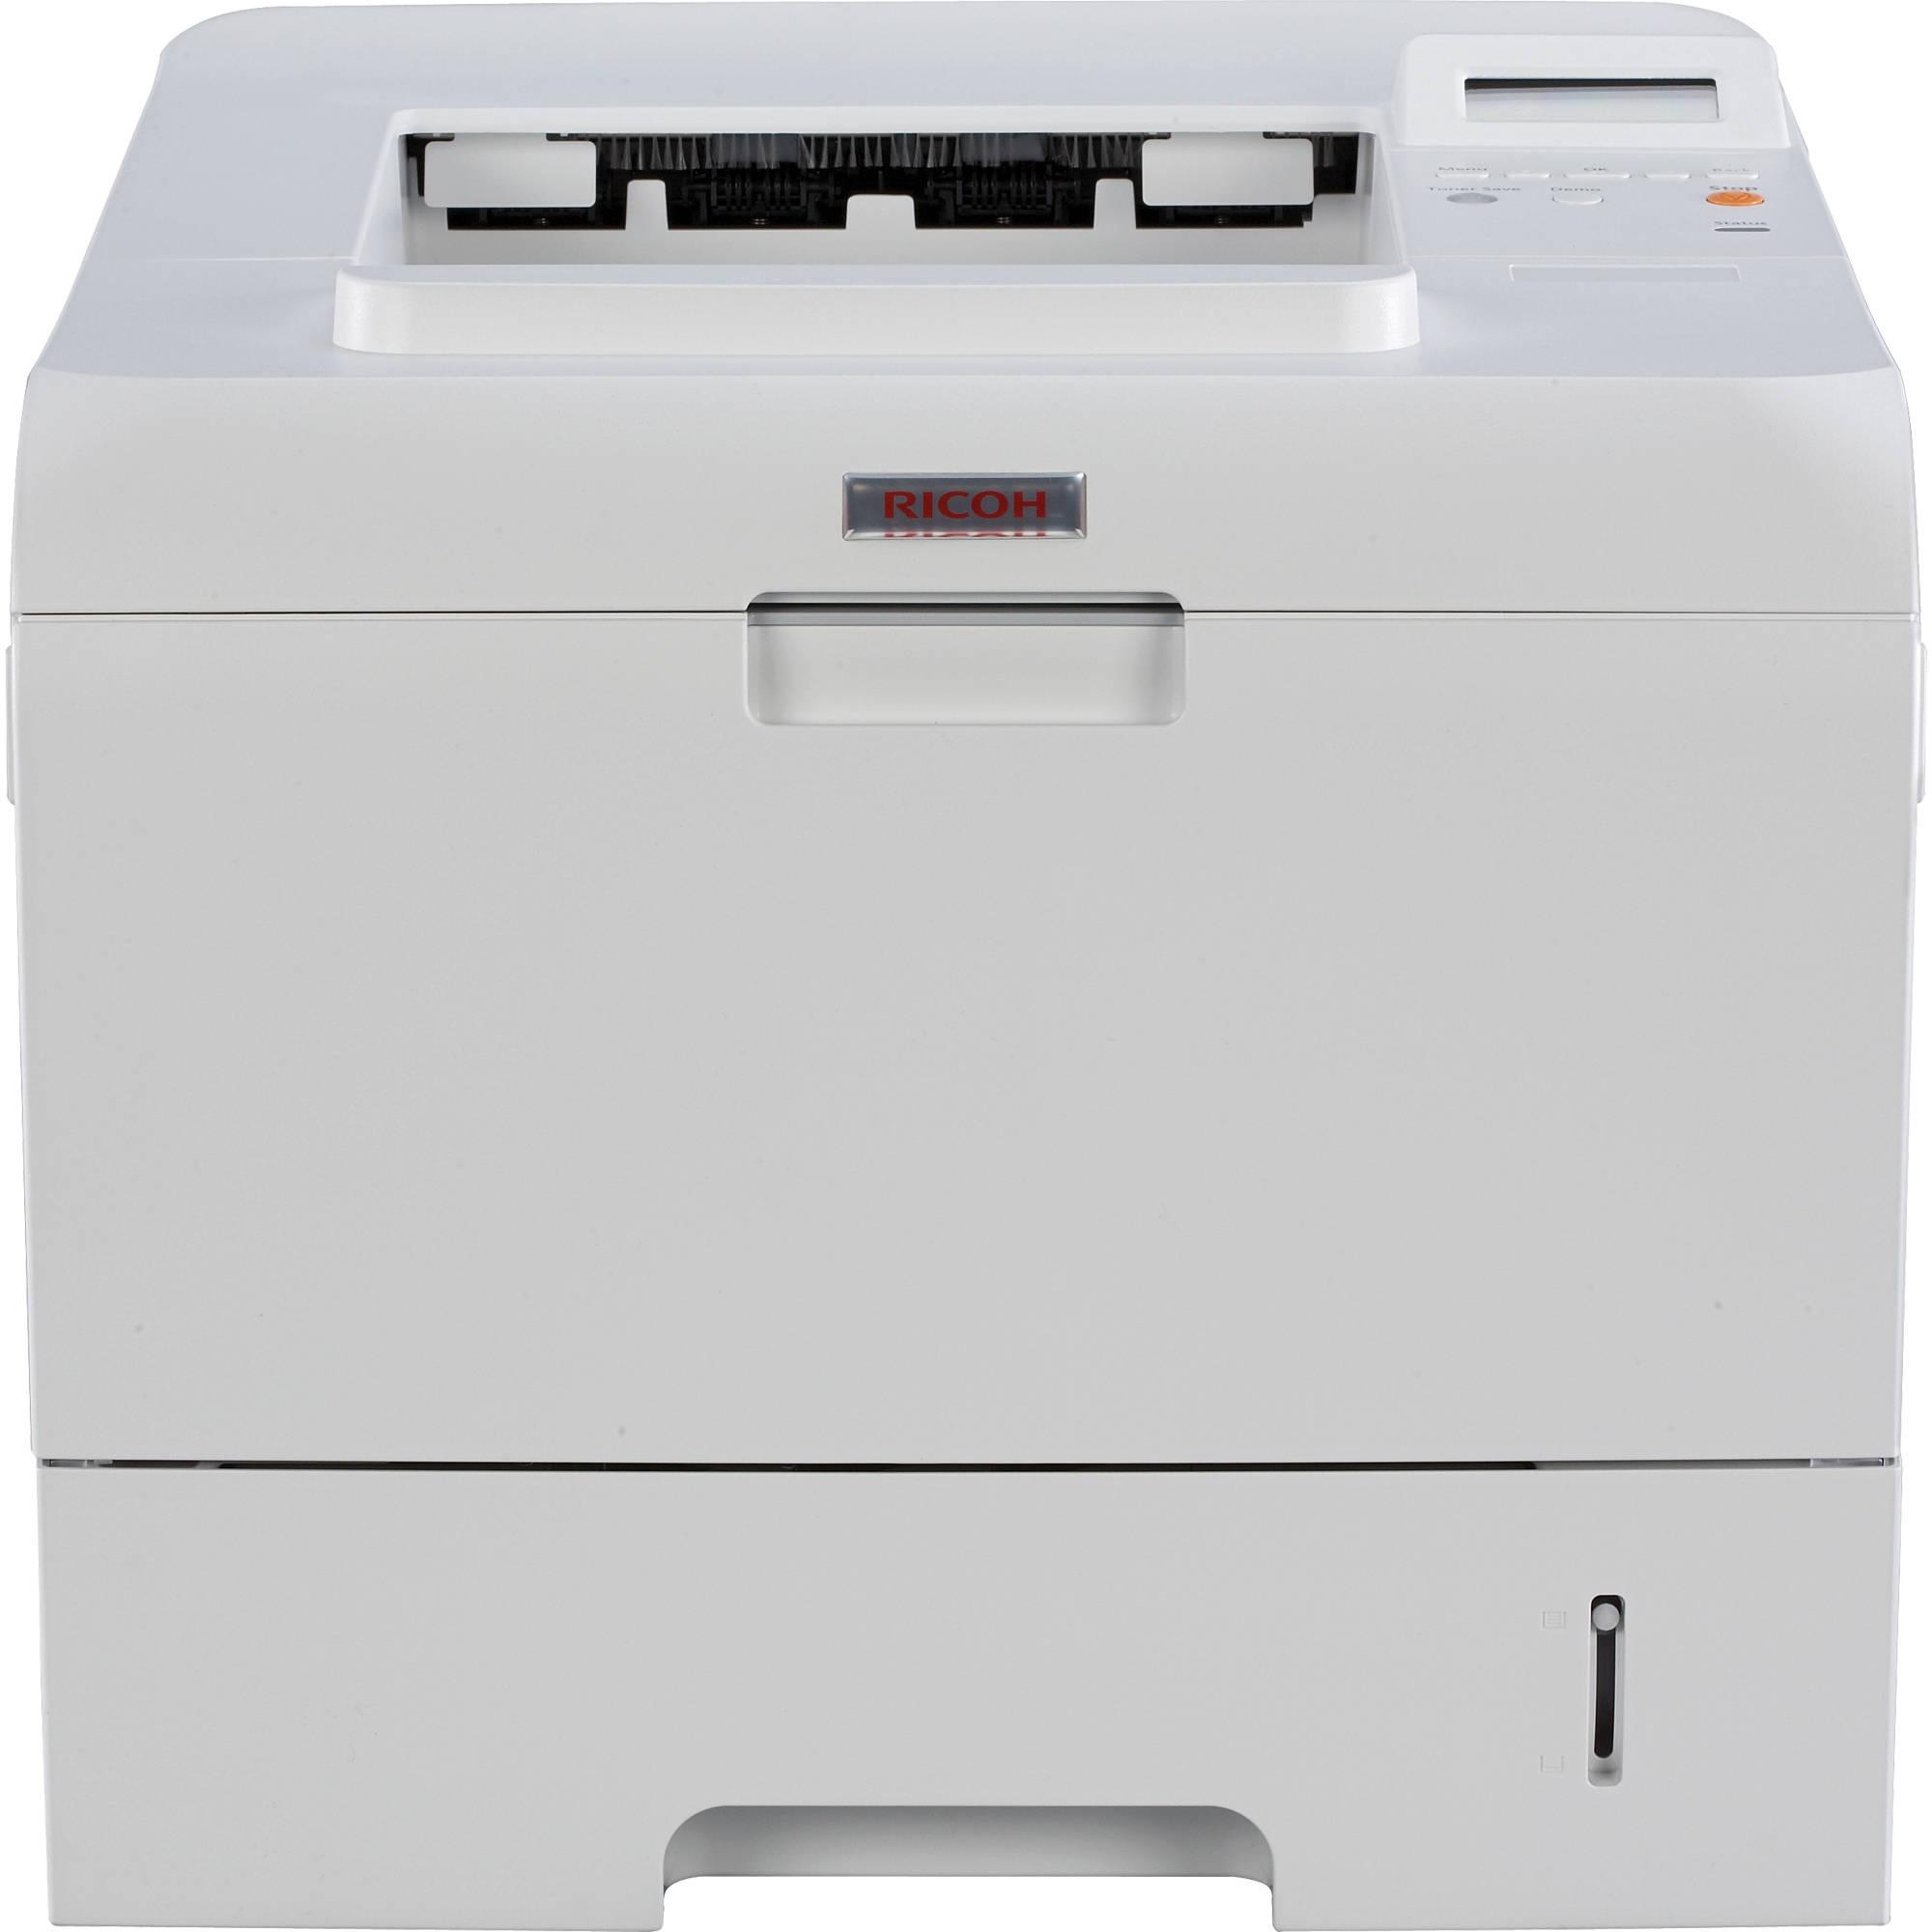 Ricoh Aficio SP C231N Printer PPD Download Driver